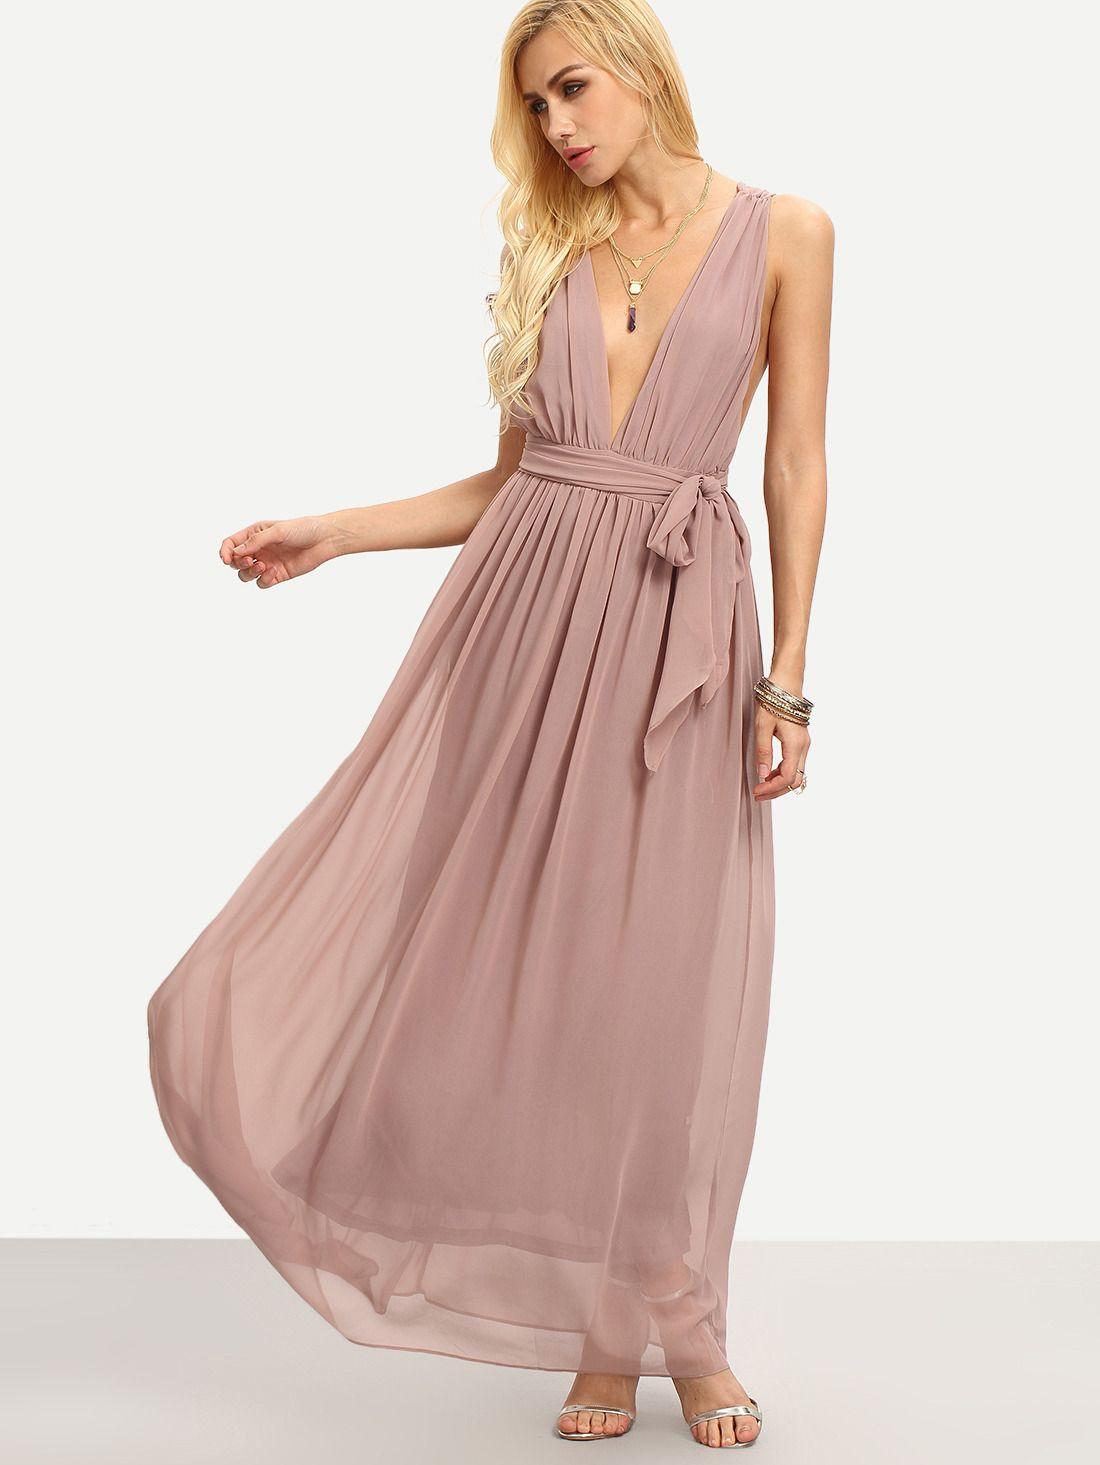 Brown Deep V Neck Tie-Waist Pleated Maxi Dress | Dream Closet by ...